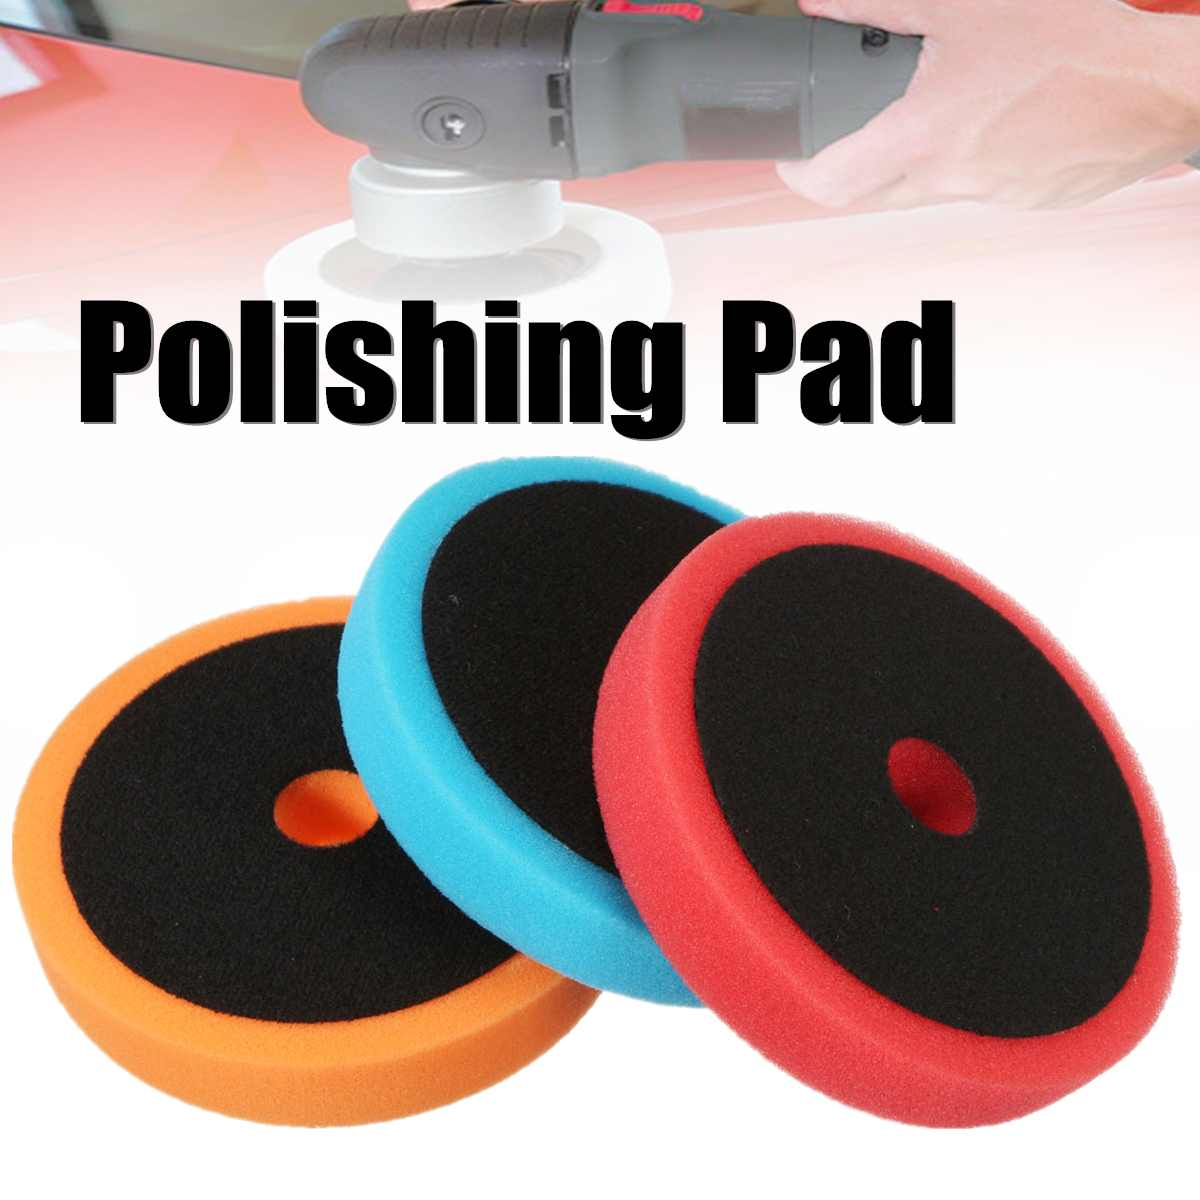 6 Inch 150mm Polishing Pad Buffing Pads Sponge Auto Car Polishing Pad For Car Polisher Buffer